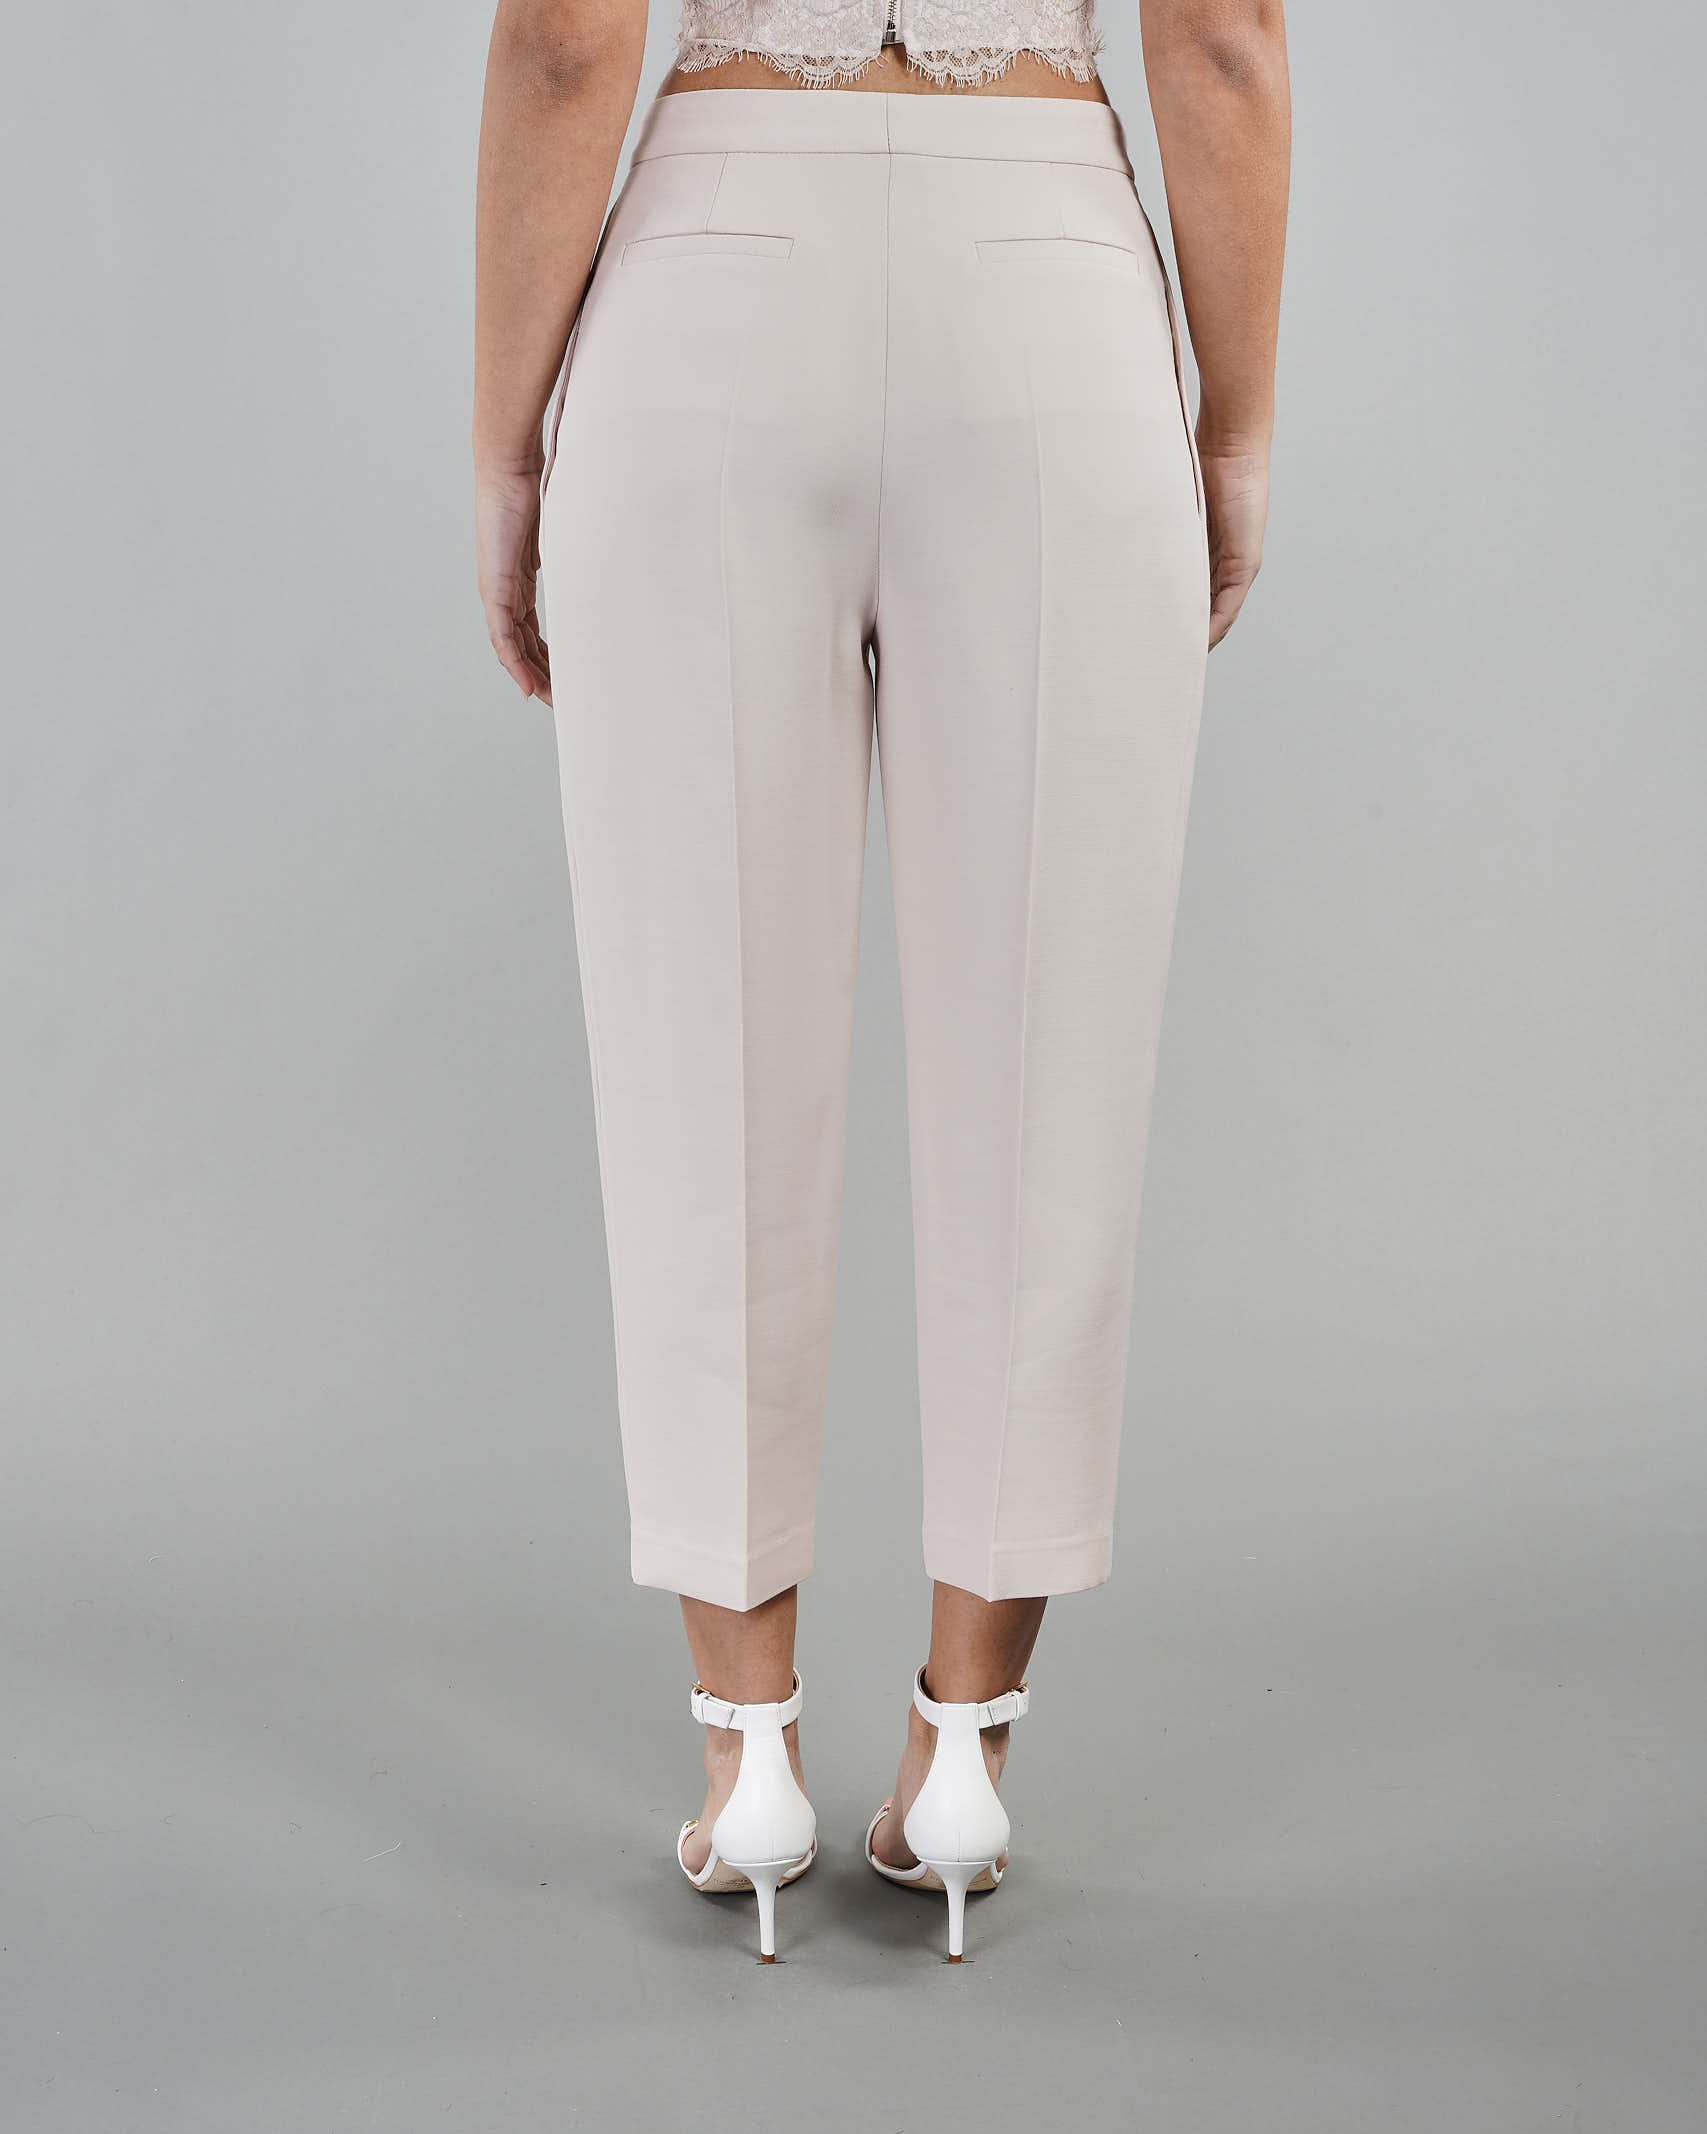 Pantalone a sigaretta Elisabetta Franchi ELISABETTA FRANCHI | Pantalone | PA37111E2686